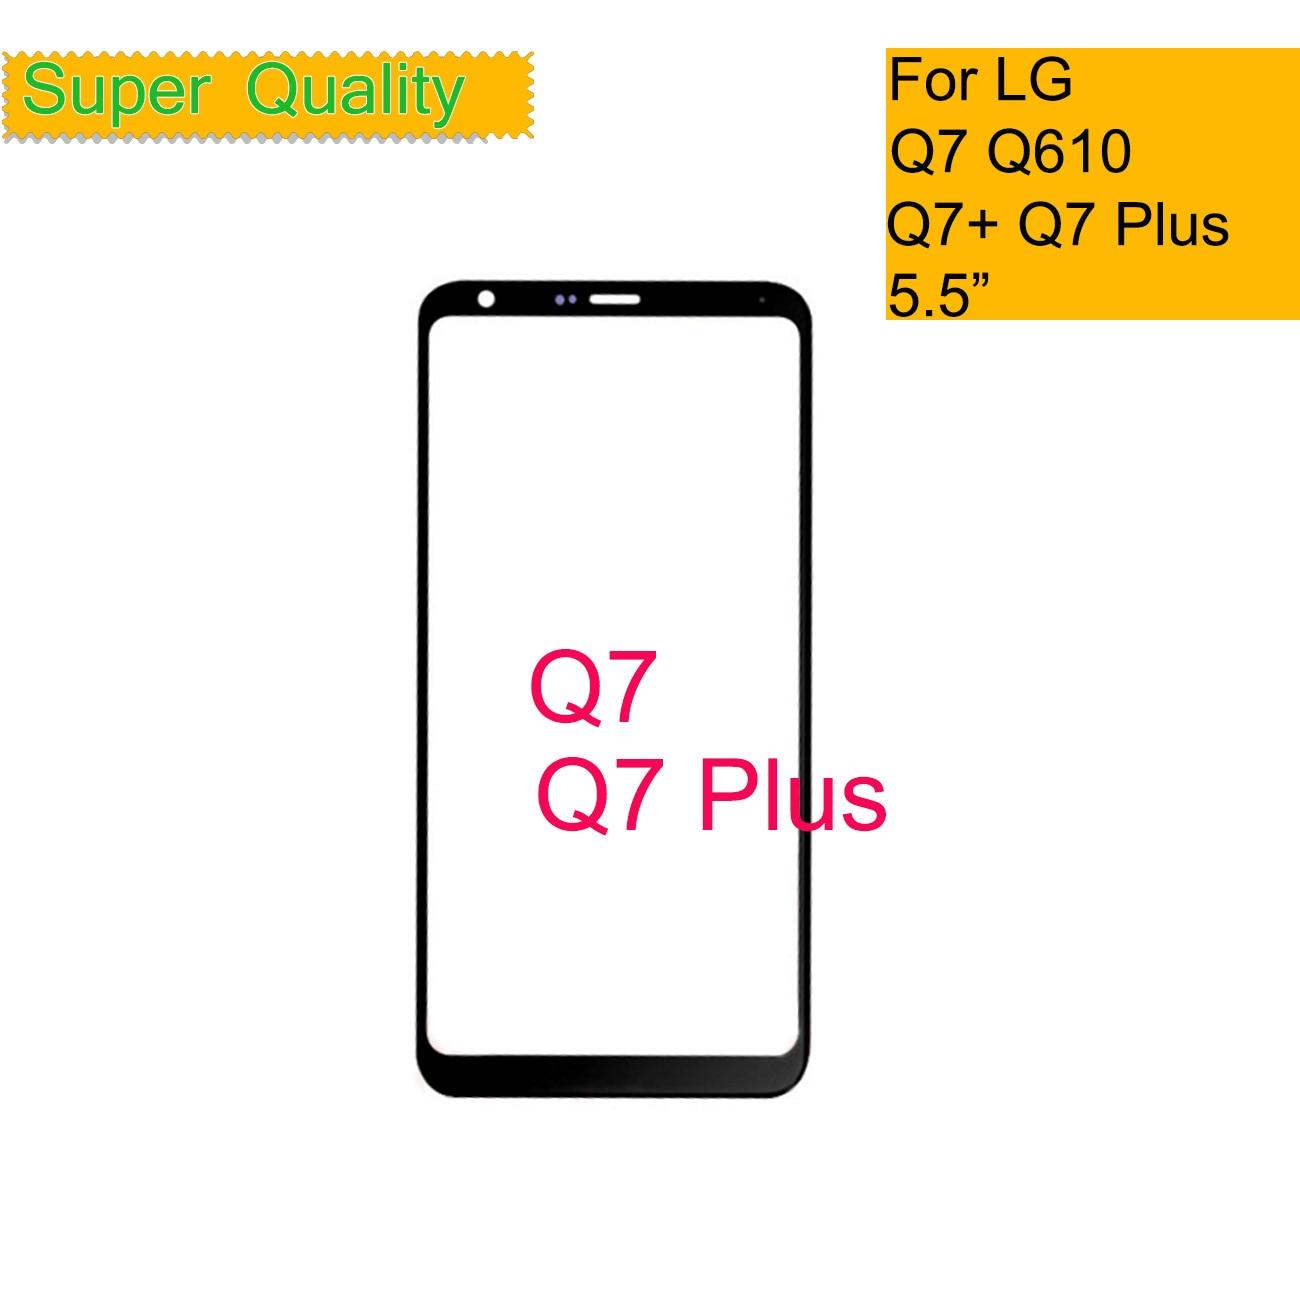 10 unids/lote para LG Q7 Q7 + Q7 Plus Q610 LMQ610 Q610TA pantalla táctil Panel frontal de vidrio exterior para LG Q7 LCD cristal